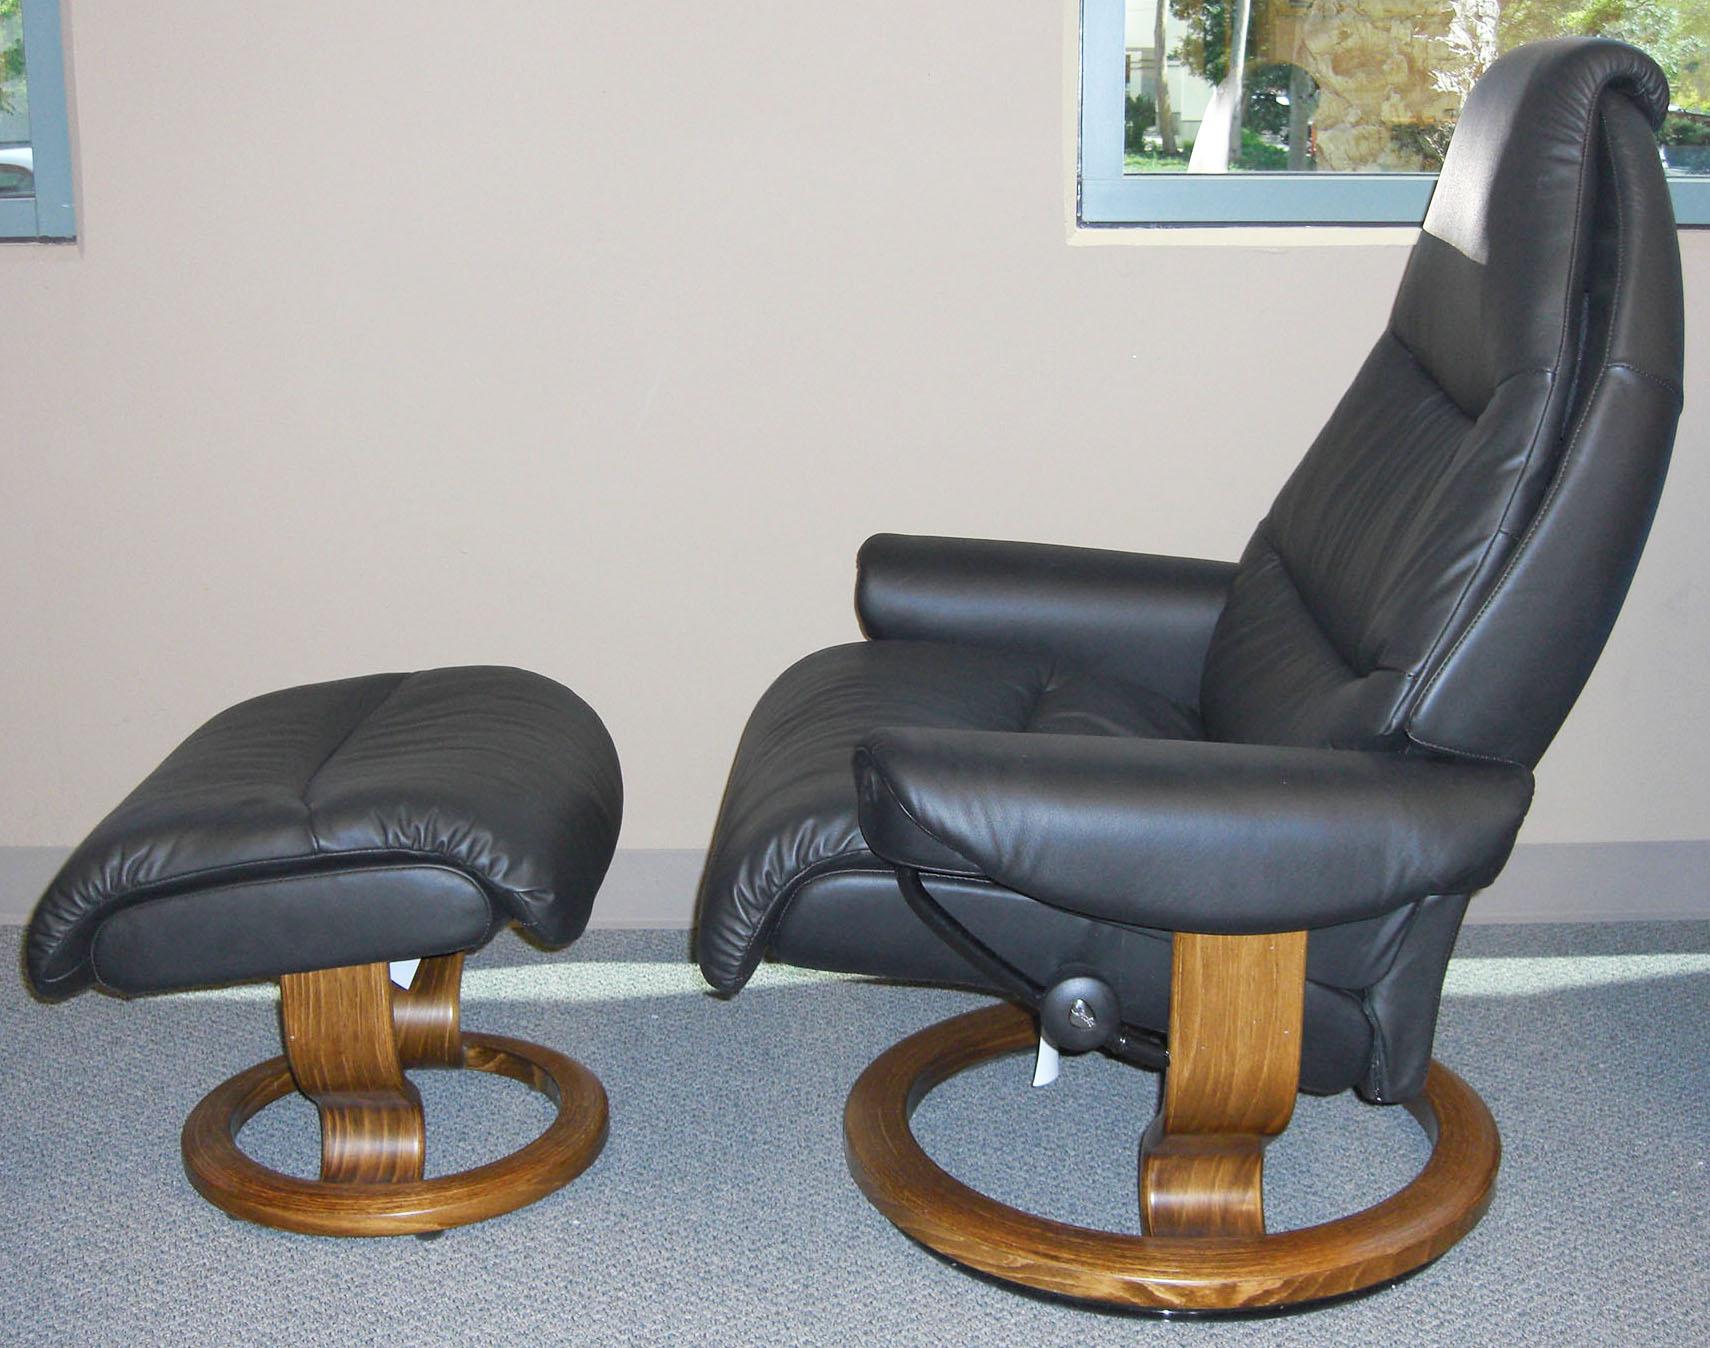 Remarkable Stressless Sofa Loveseat Recliner Chair And Ottoman By Ekornes Machost Co Dining Chair Design Ideas Machostcouk